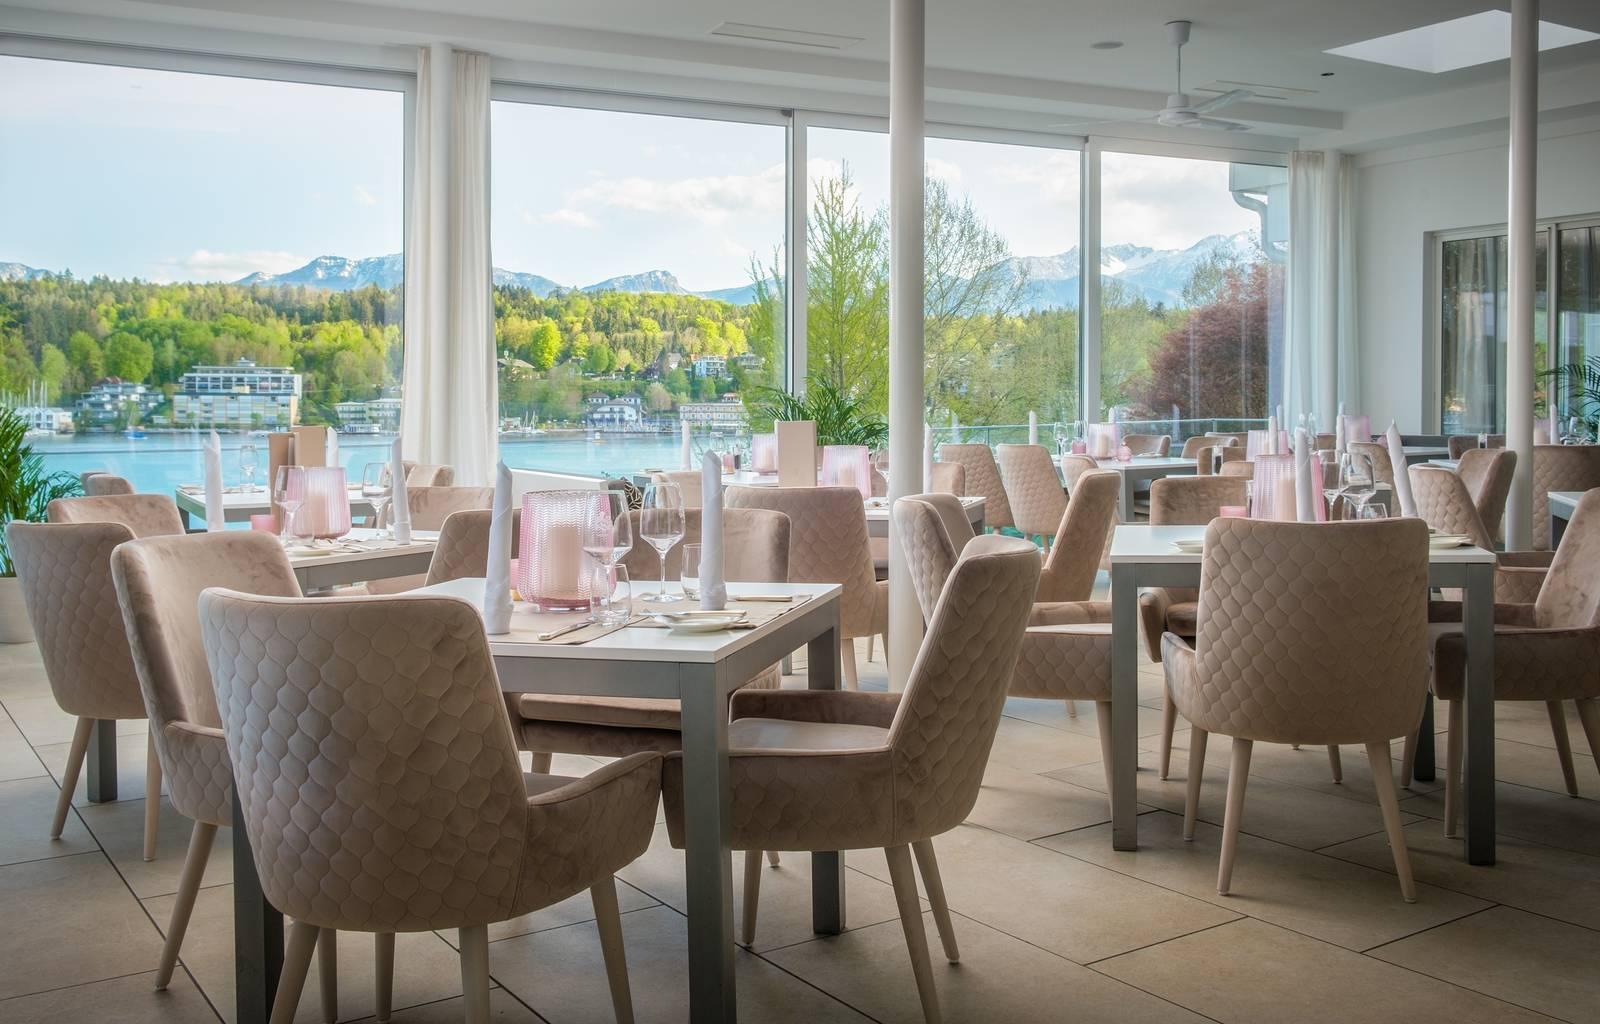 Seehotel Europa Restaurant